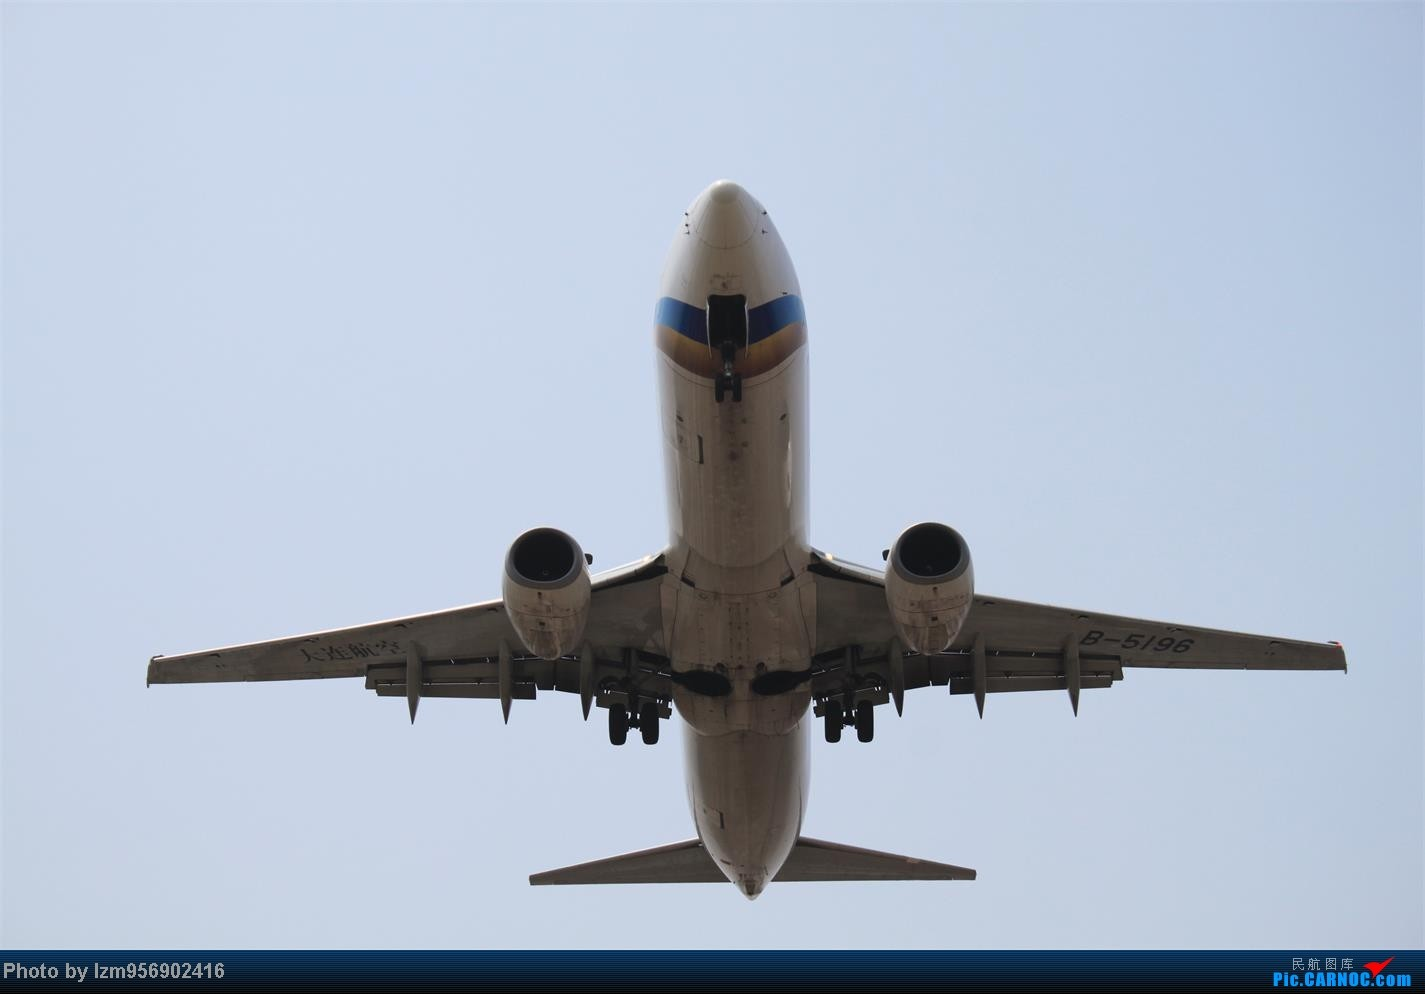 Re:[原创]DLC蹲点大半天,拍到了大棒航空772=w= BOEING 737-800 B-5196 中国大连周水子机场